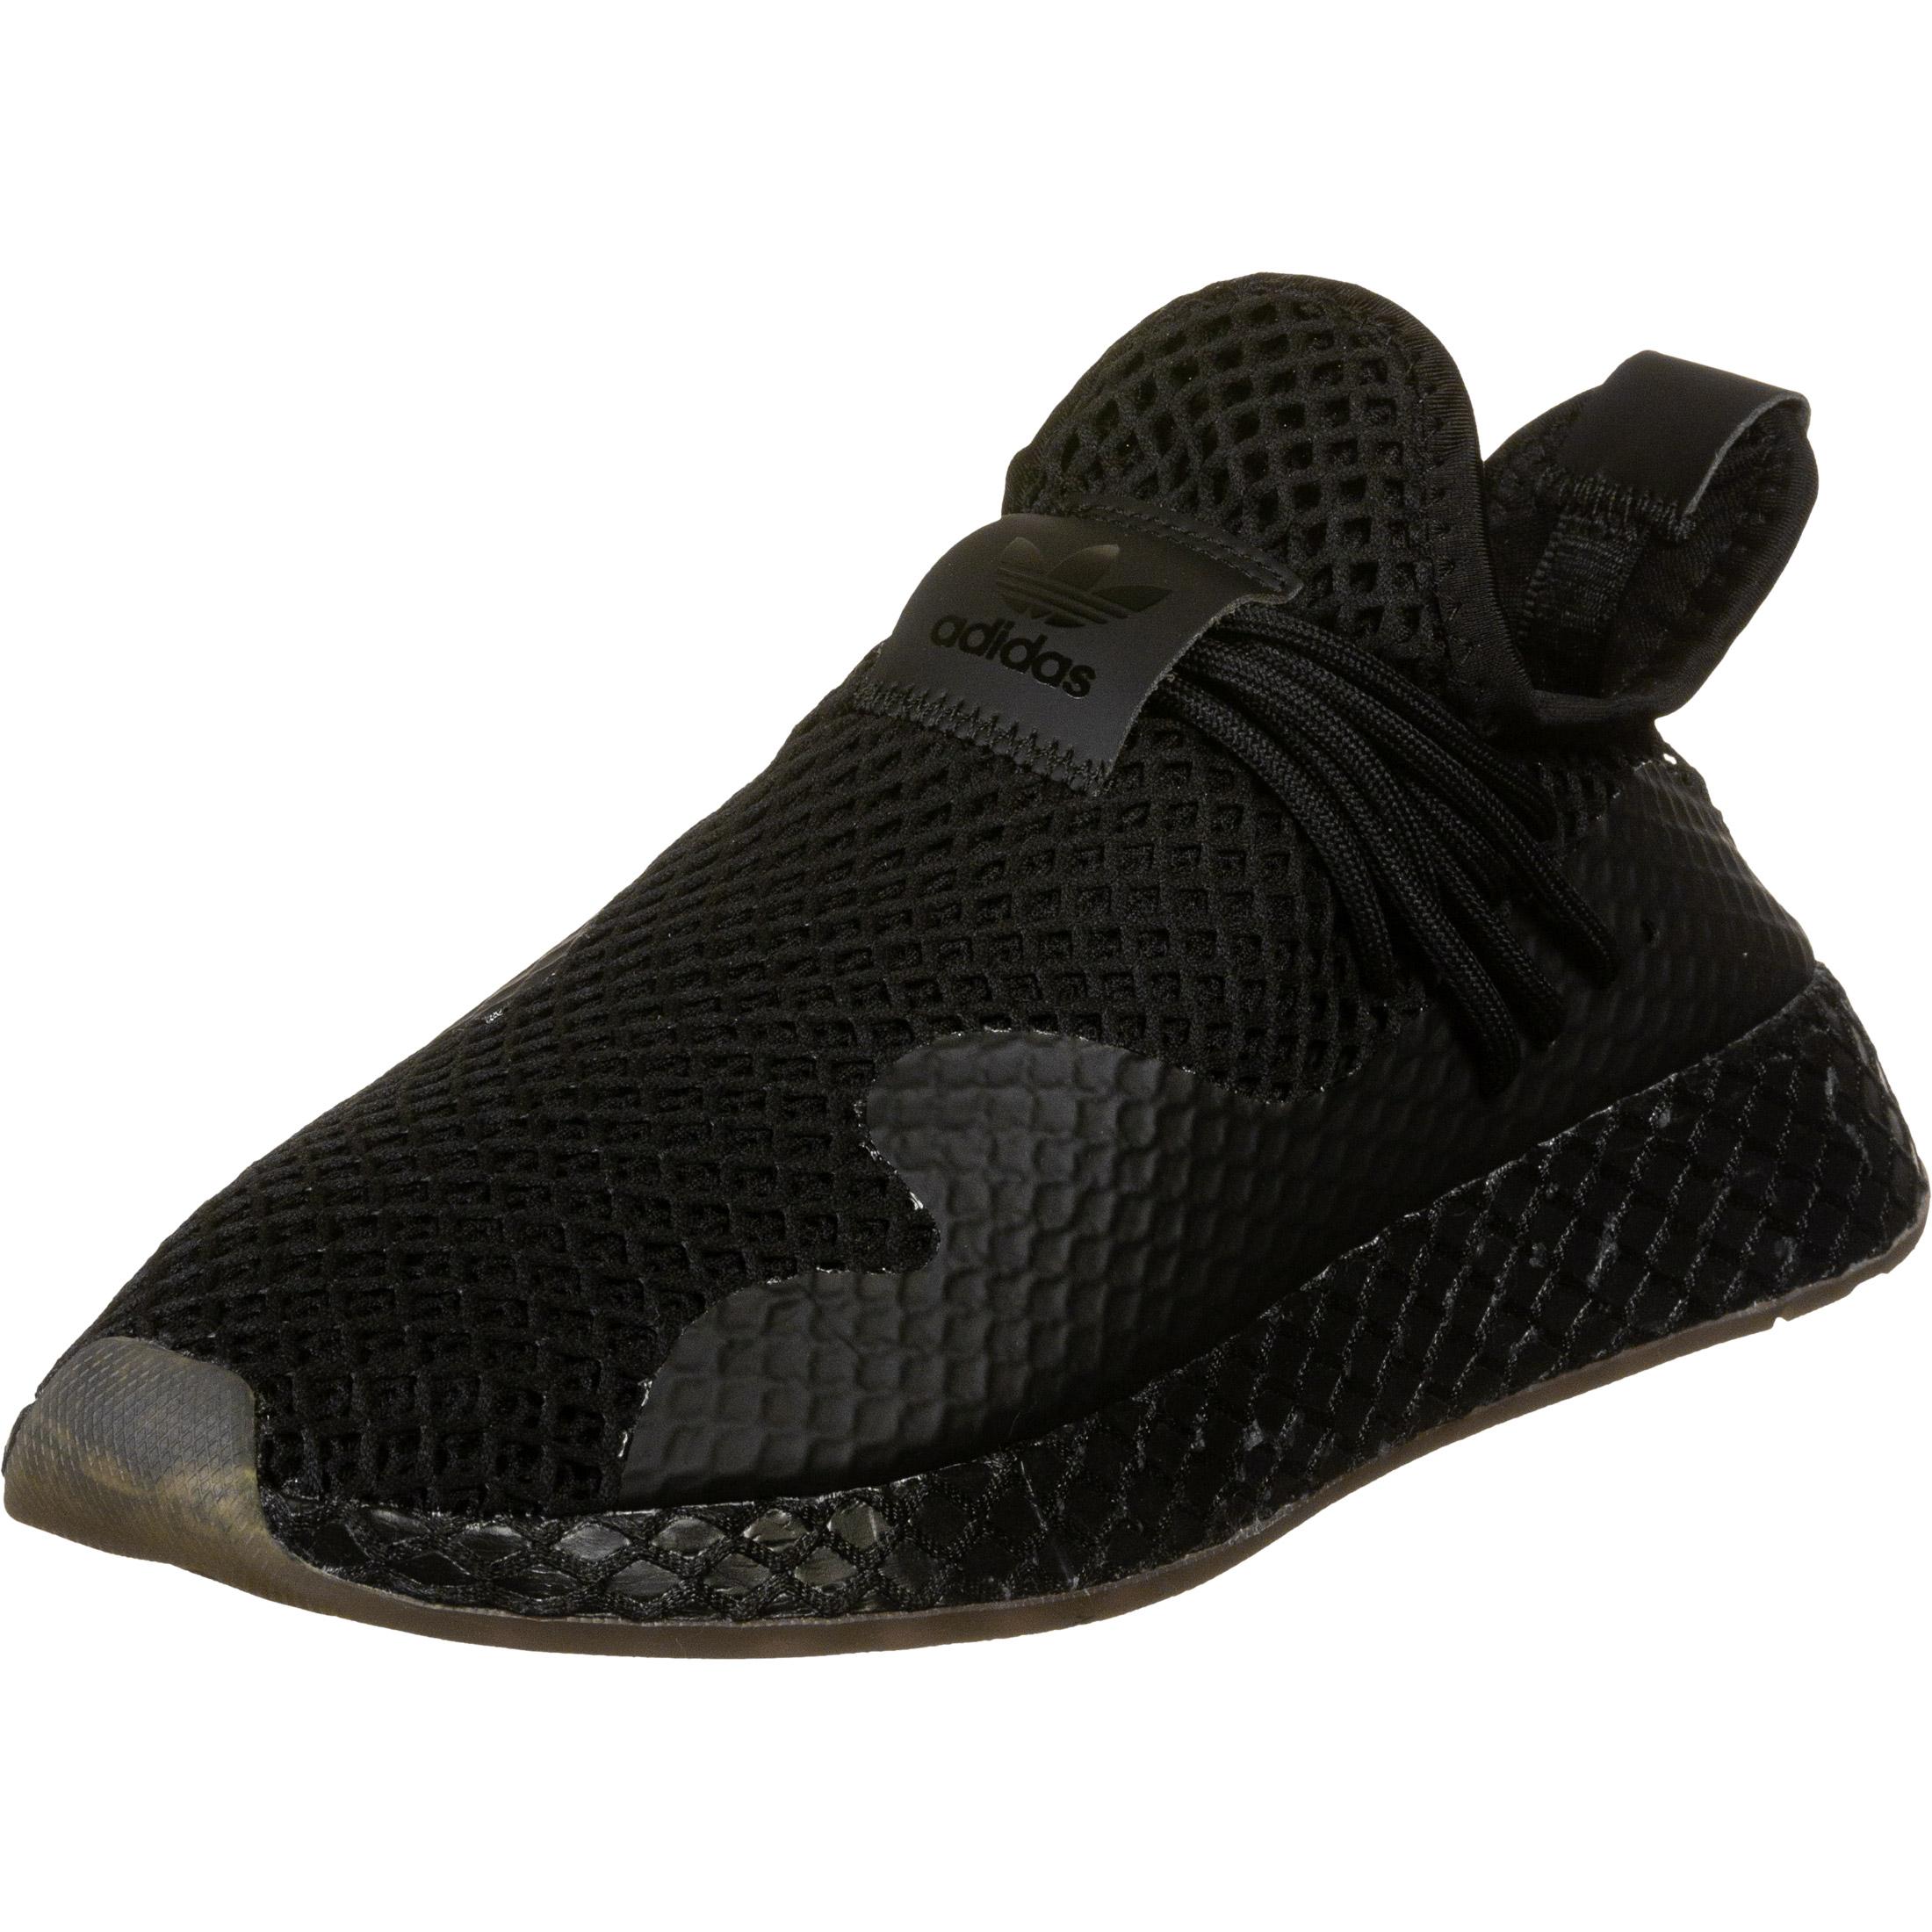 adidas Deerupt S - Sneakers Low at